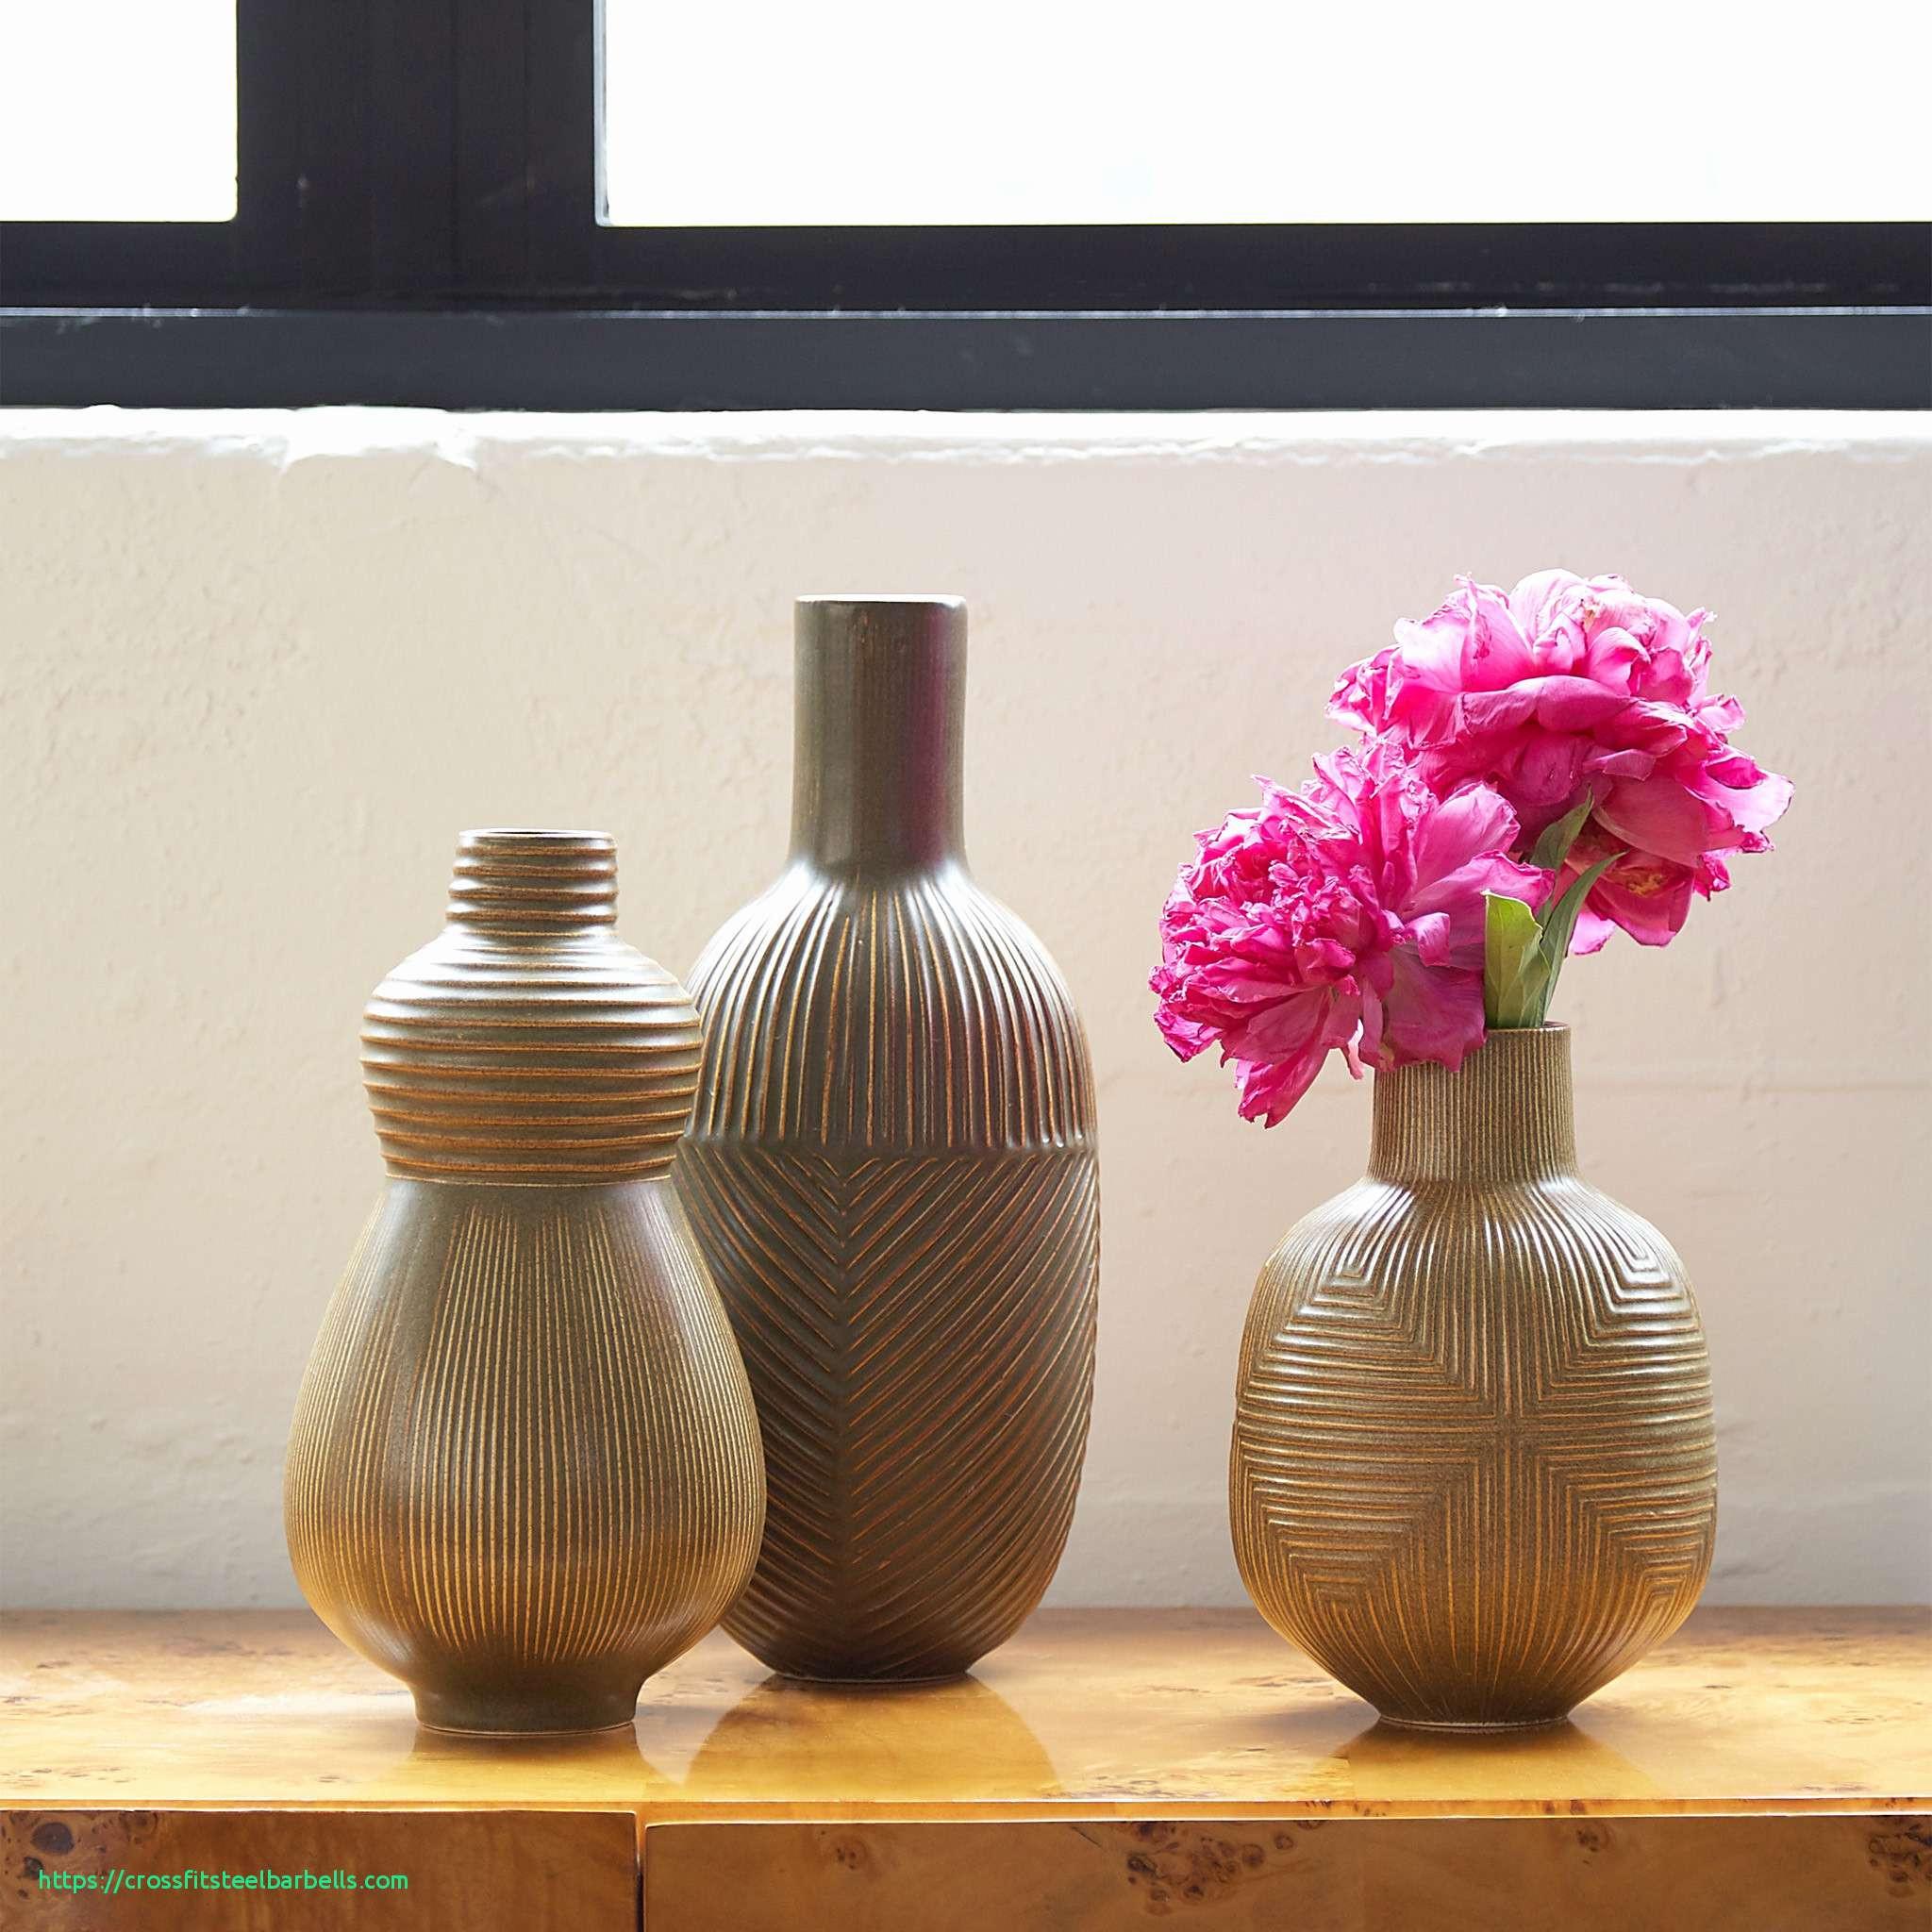 flowers in vase decor of interior decor flower vase best of vase decoration beau vases flower in interior decor flower vase best of vase decoration beau vases flower vase decoration clay class i